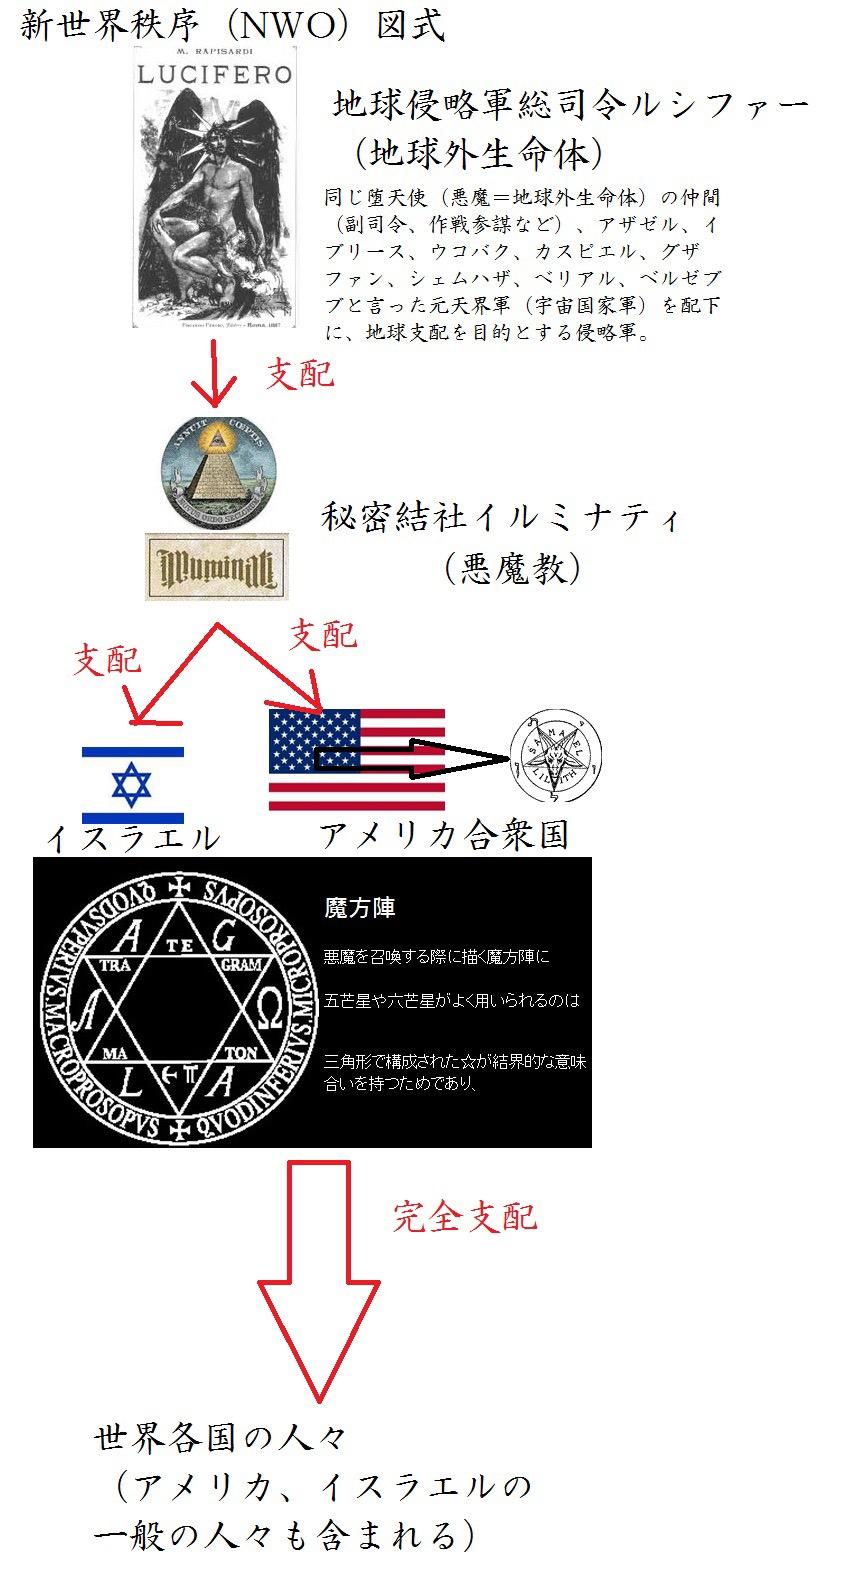 http://blog-imgs-81.fc2.com/o/k/a/okarutojishinyogen/news_1440989066_12301.jpg